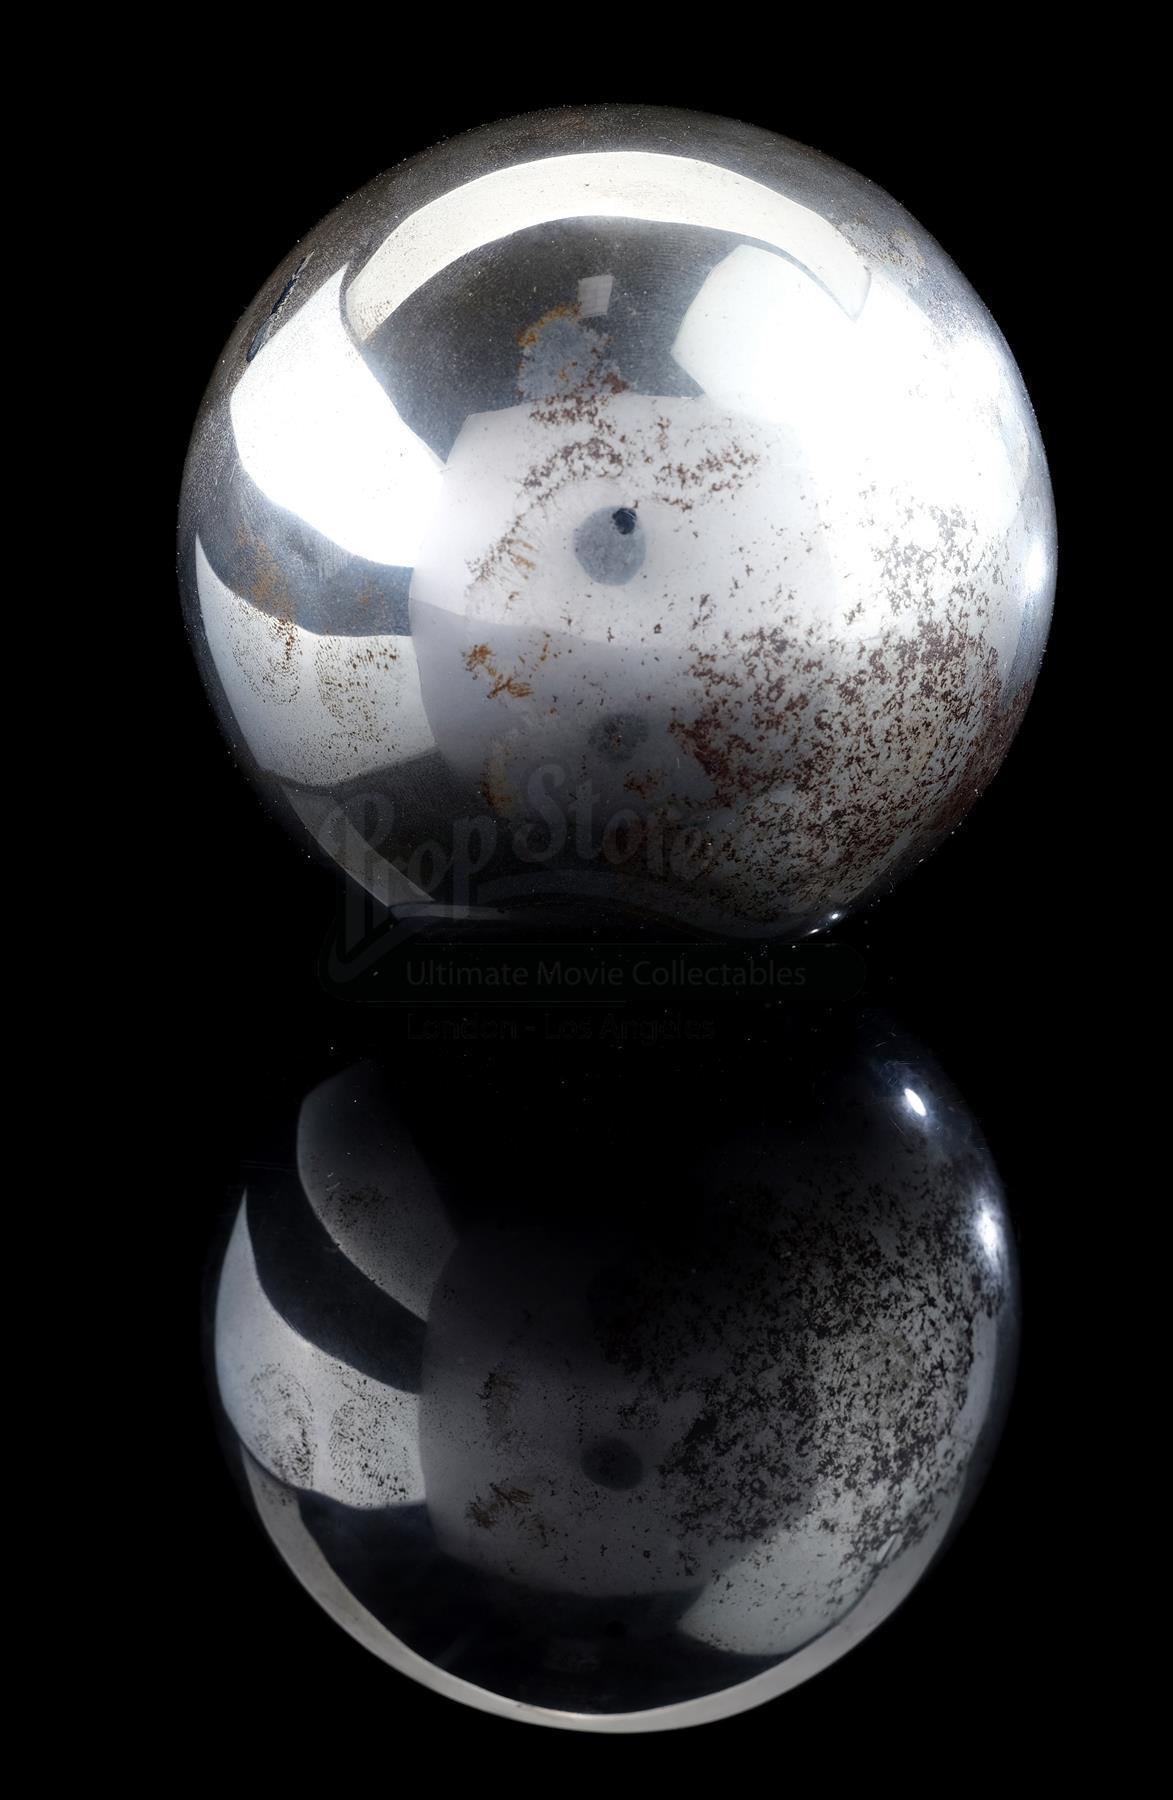 Rollerball_Ball-Real Prop (5).jpg